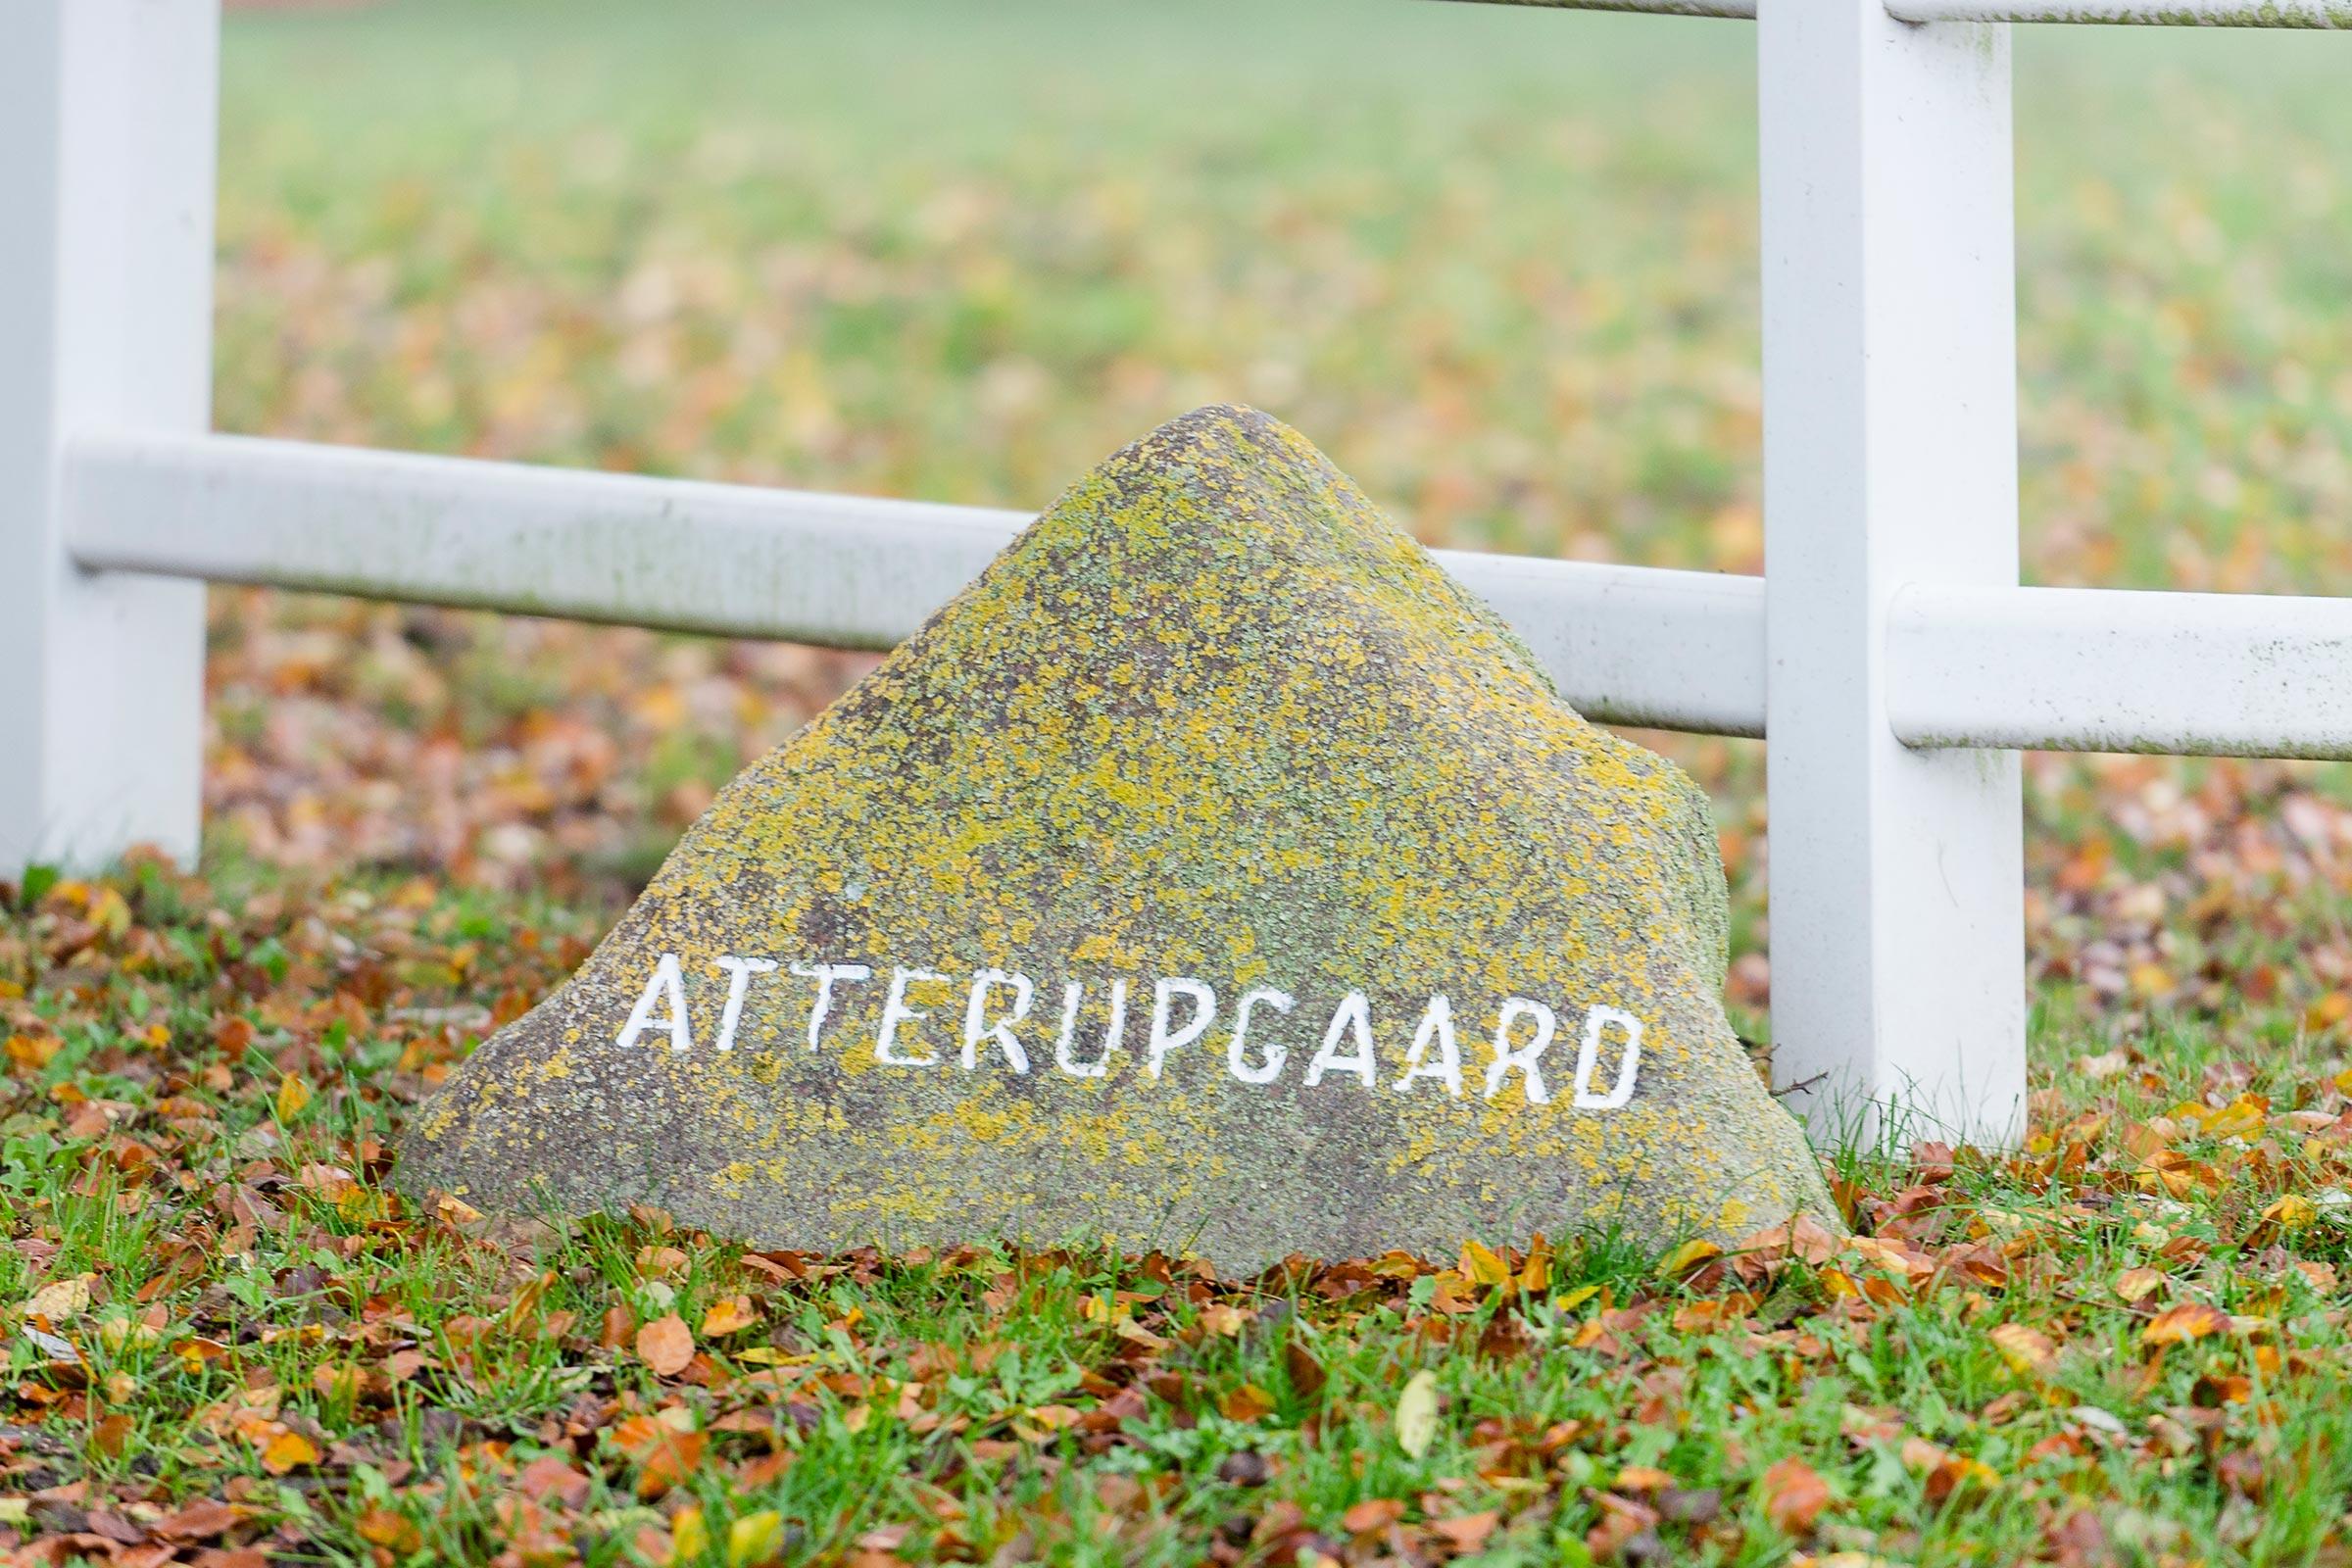 Atterupgaard-1001